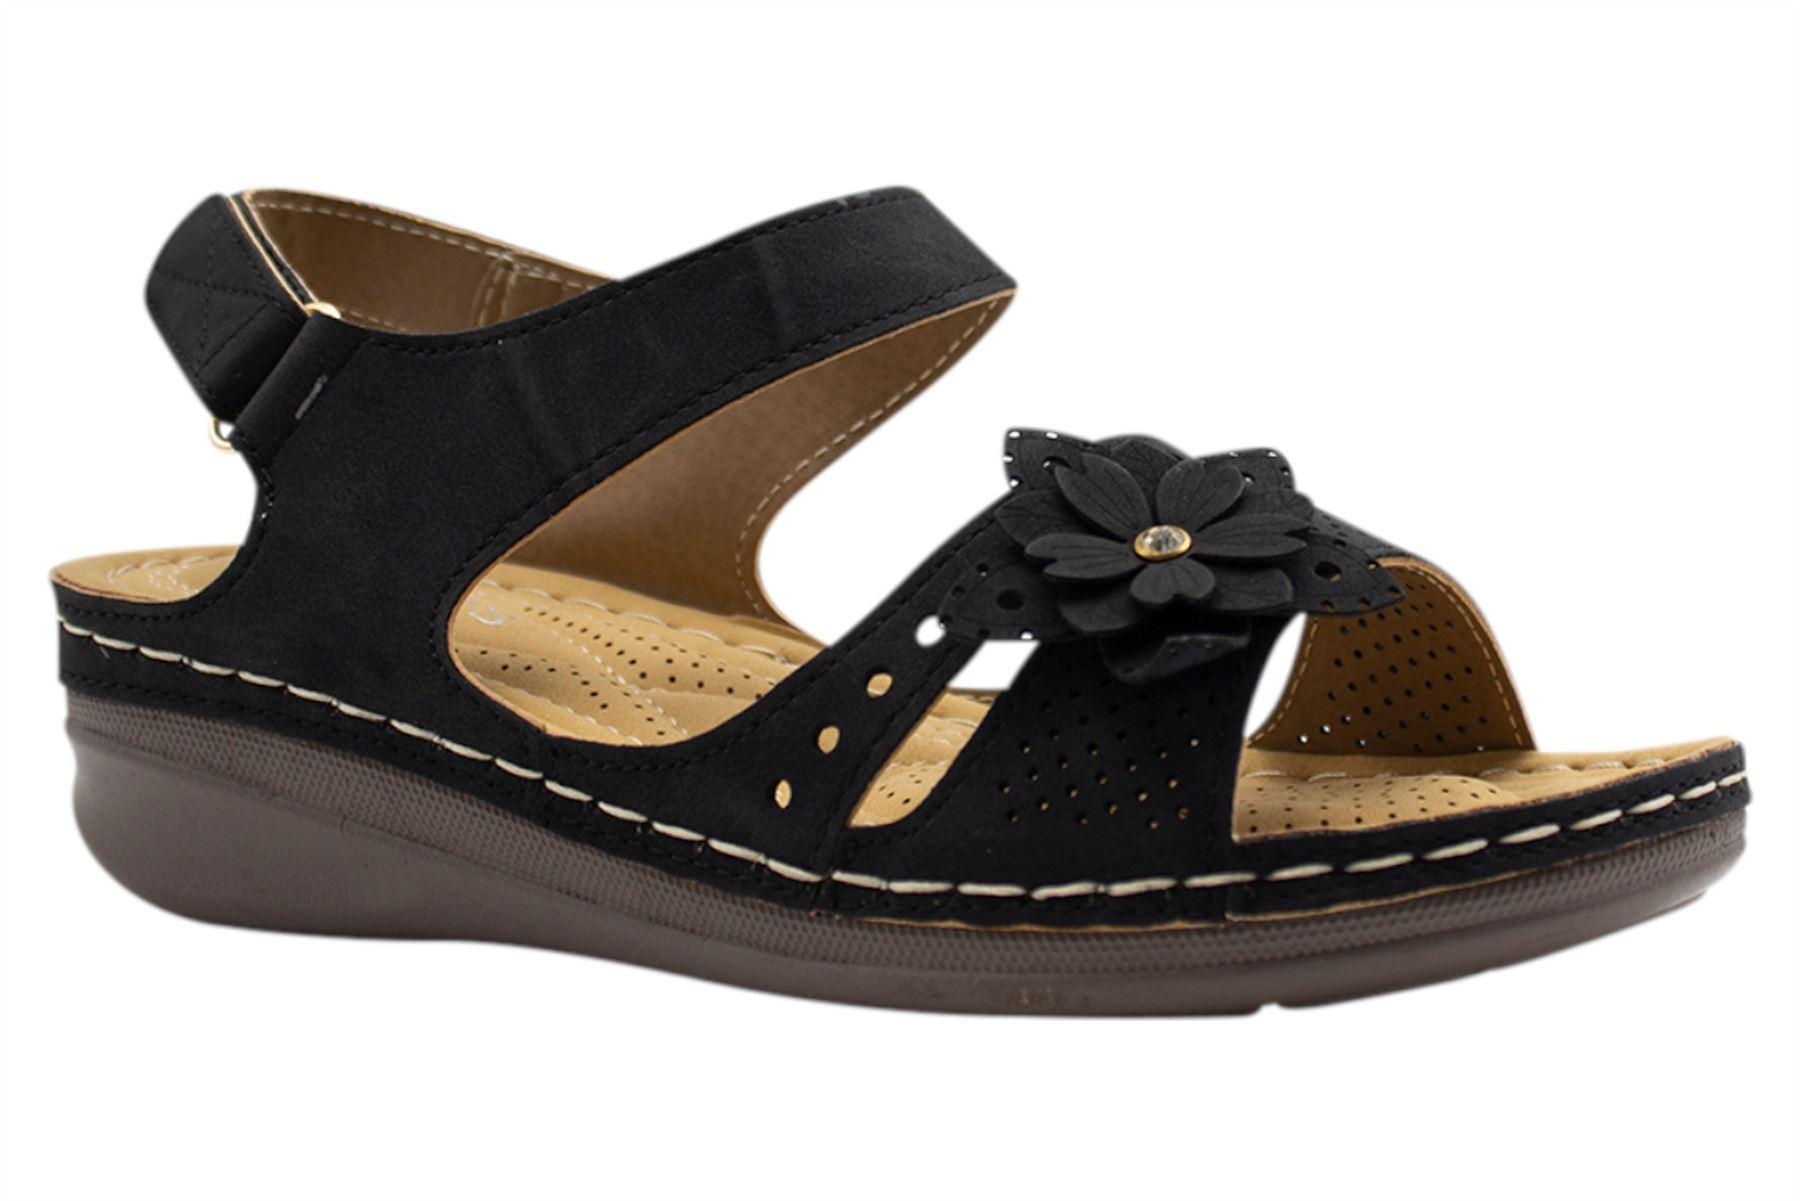 Ladies-Wedge-Heel-Sandal-Womens-Comfort-Cushion-Strapy-Summer-Shoes miniatura 14